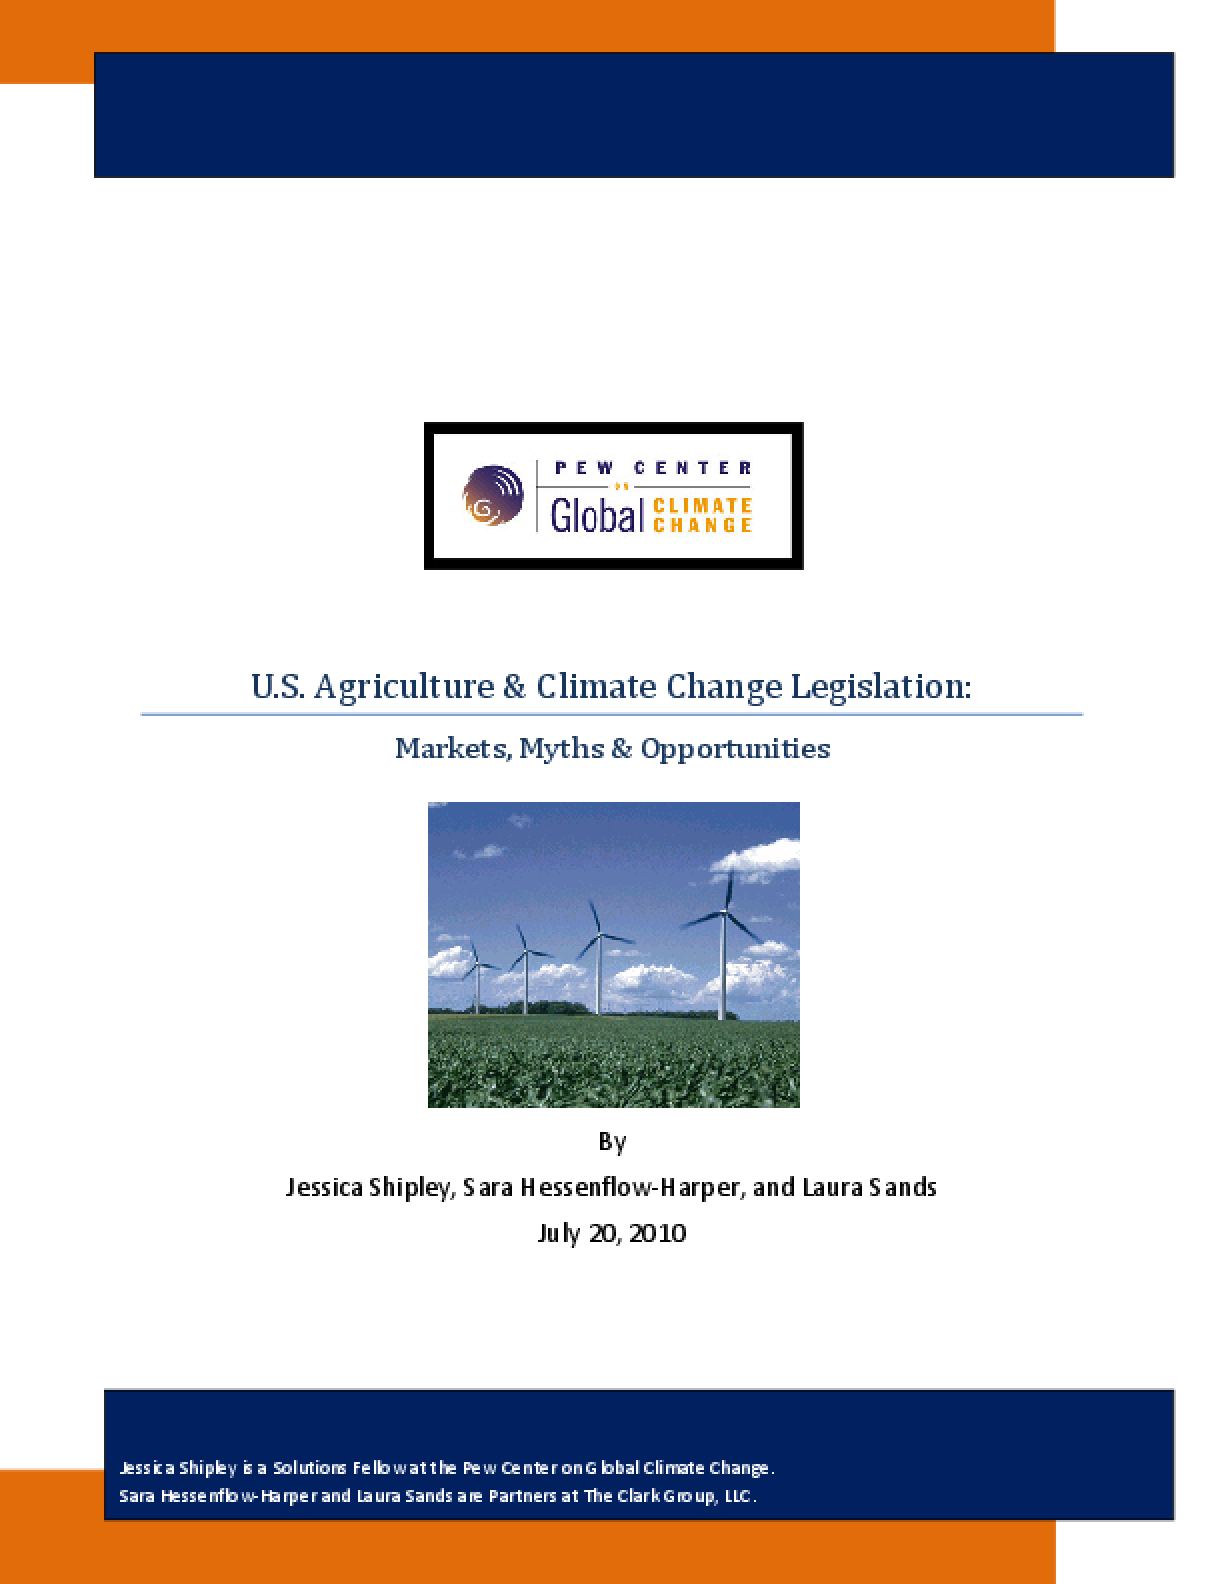 U.S. Agriculture & Climate Change Legislation: Markets, Myths & Opportunities